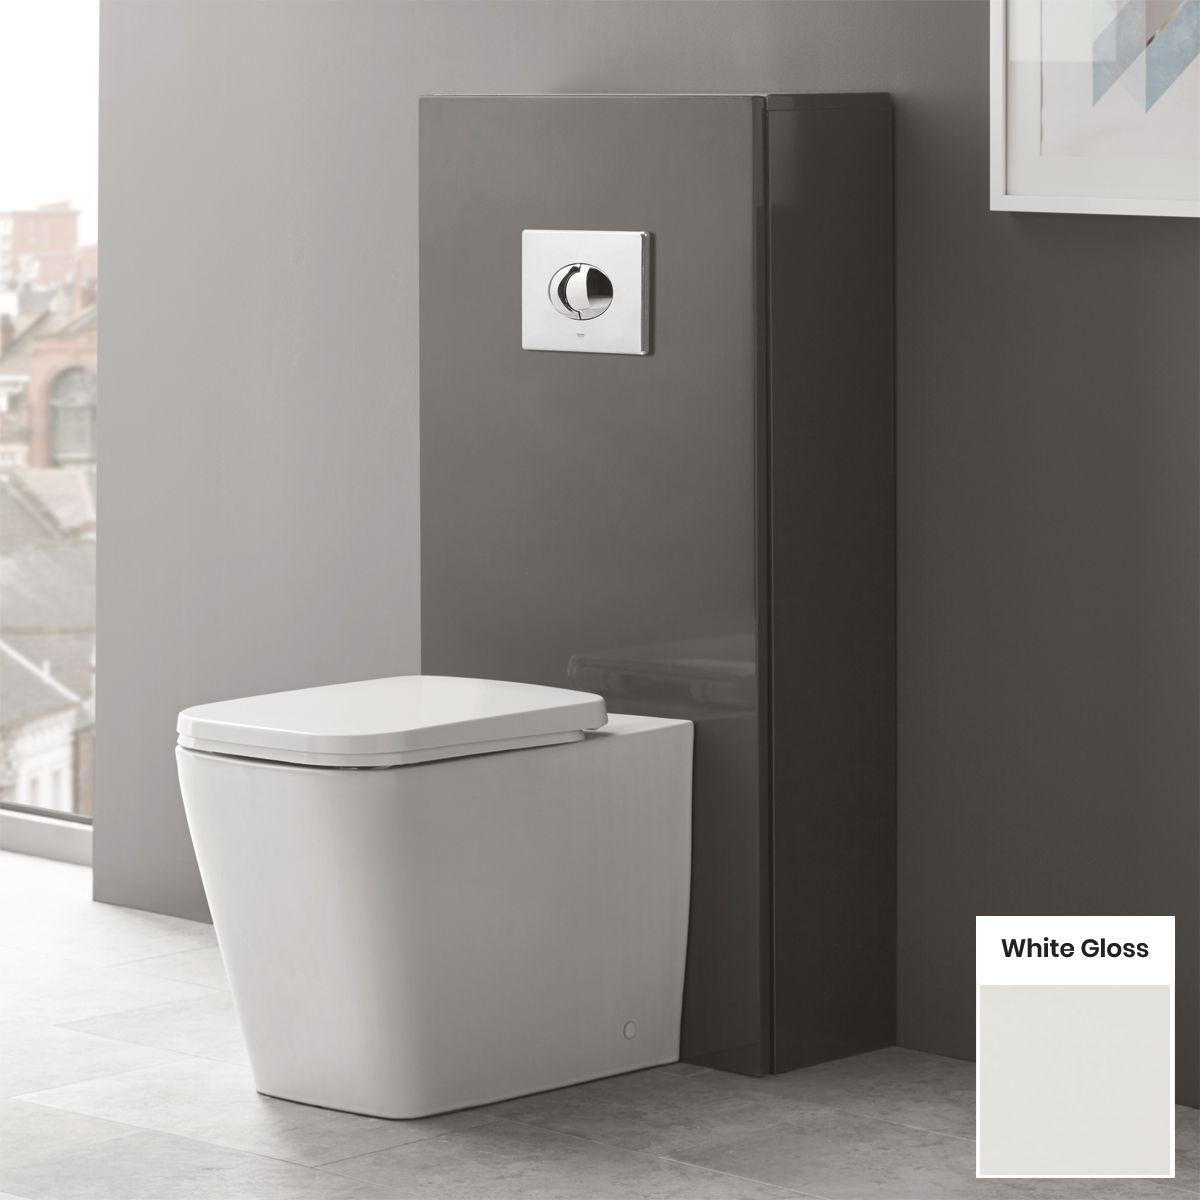 Elation Eko White Gloss WC Unit 550mm